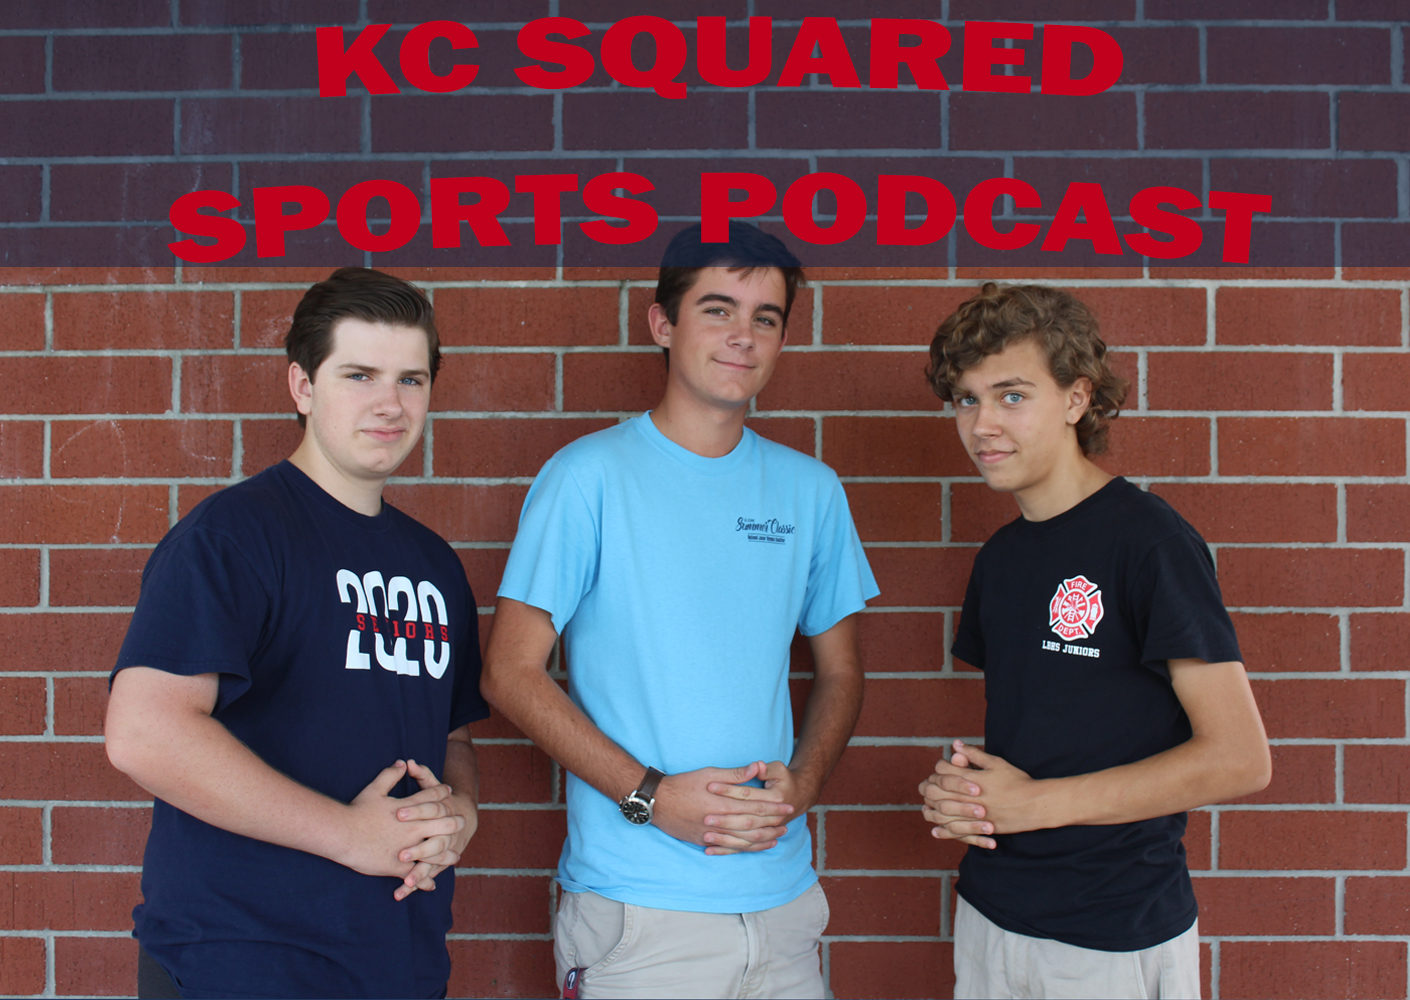 KC Squared podcast members include Keaton Johnson, Carson Cashion, and Carson Yore.